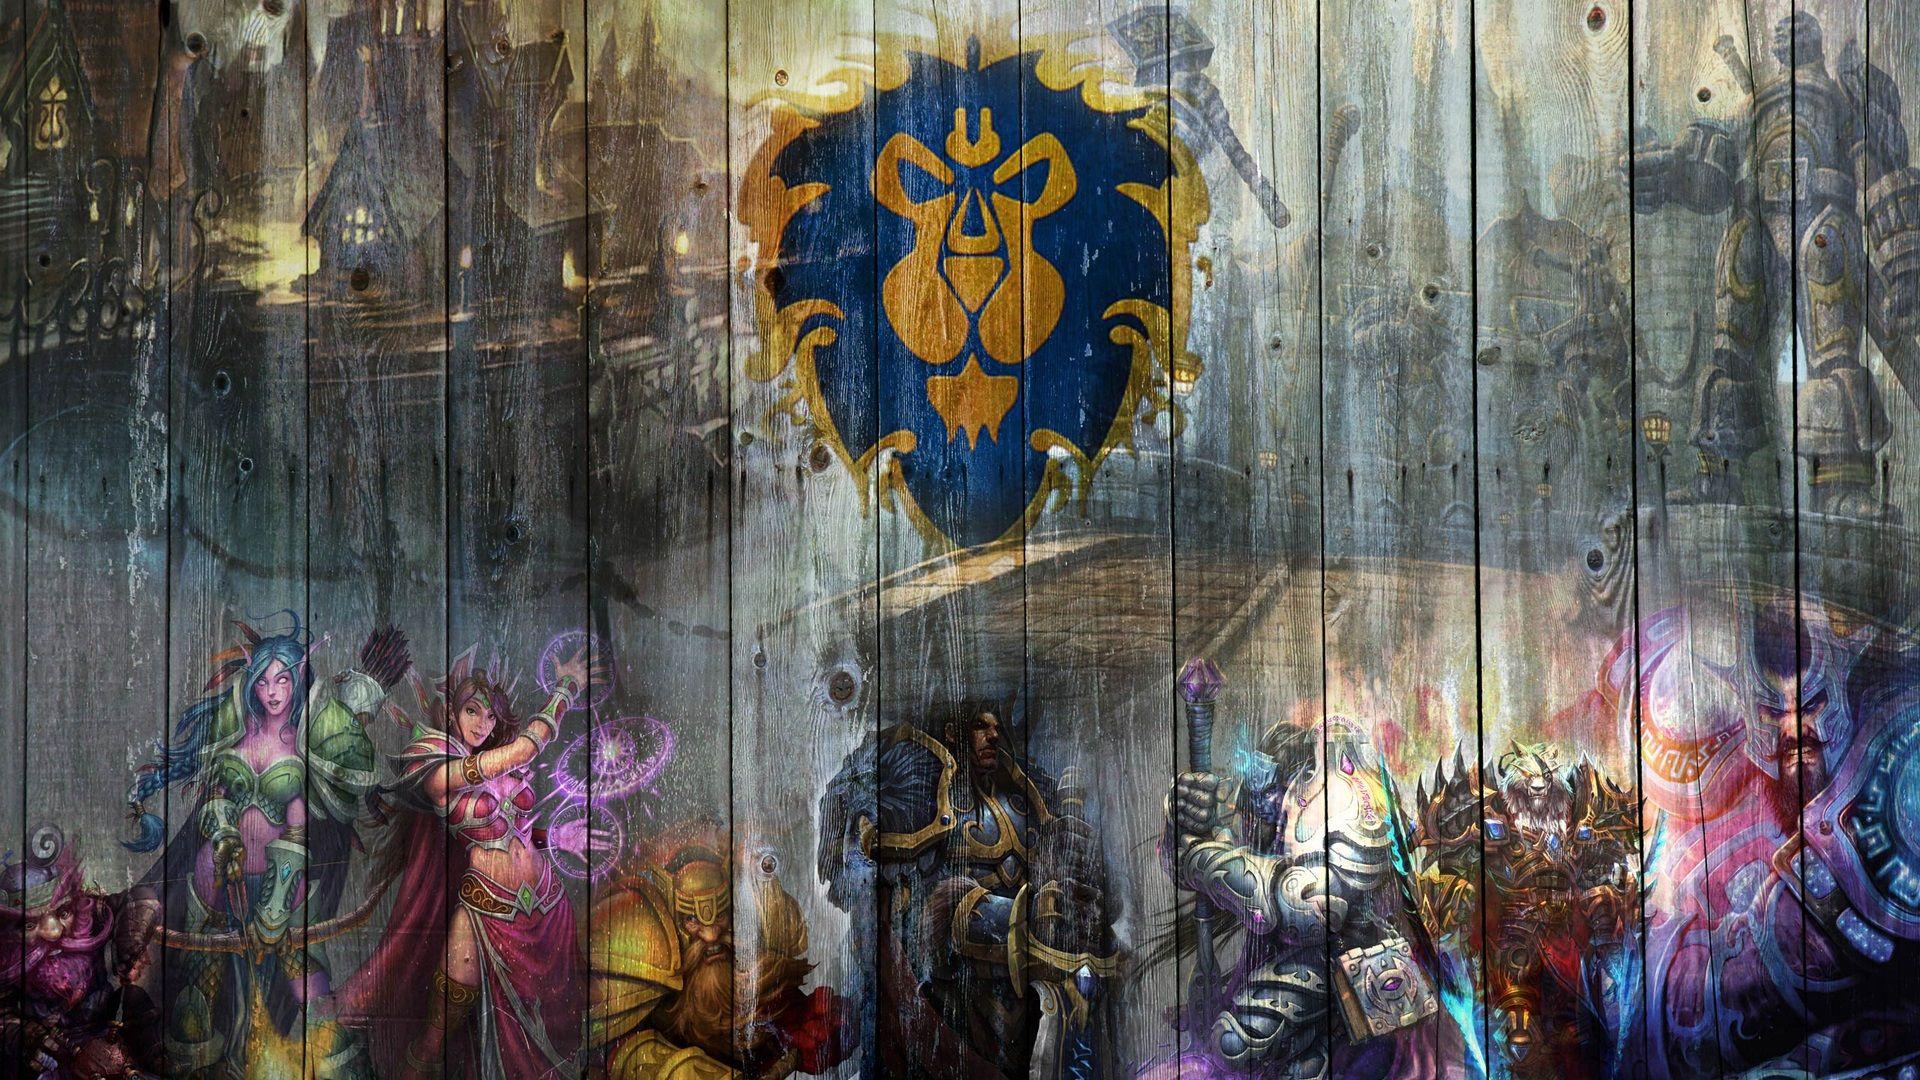 Download 1920x1080 Hd Wallpaper World Of Warcraft Hero Background Dwarf Knight Archer Desktop Backgro World Of Warcraft Wallpaper Warcraft Heroes Warcraft Art